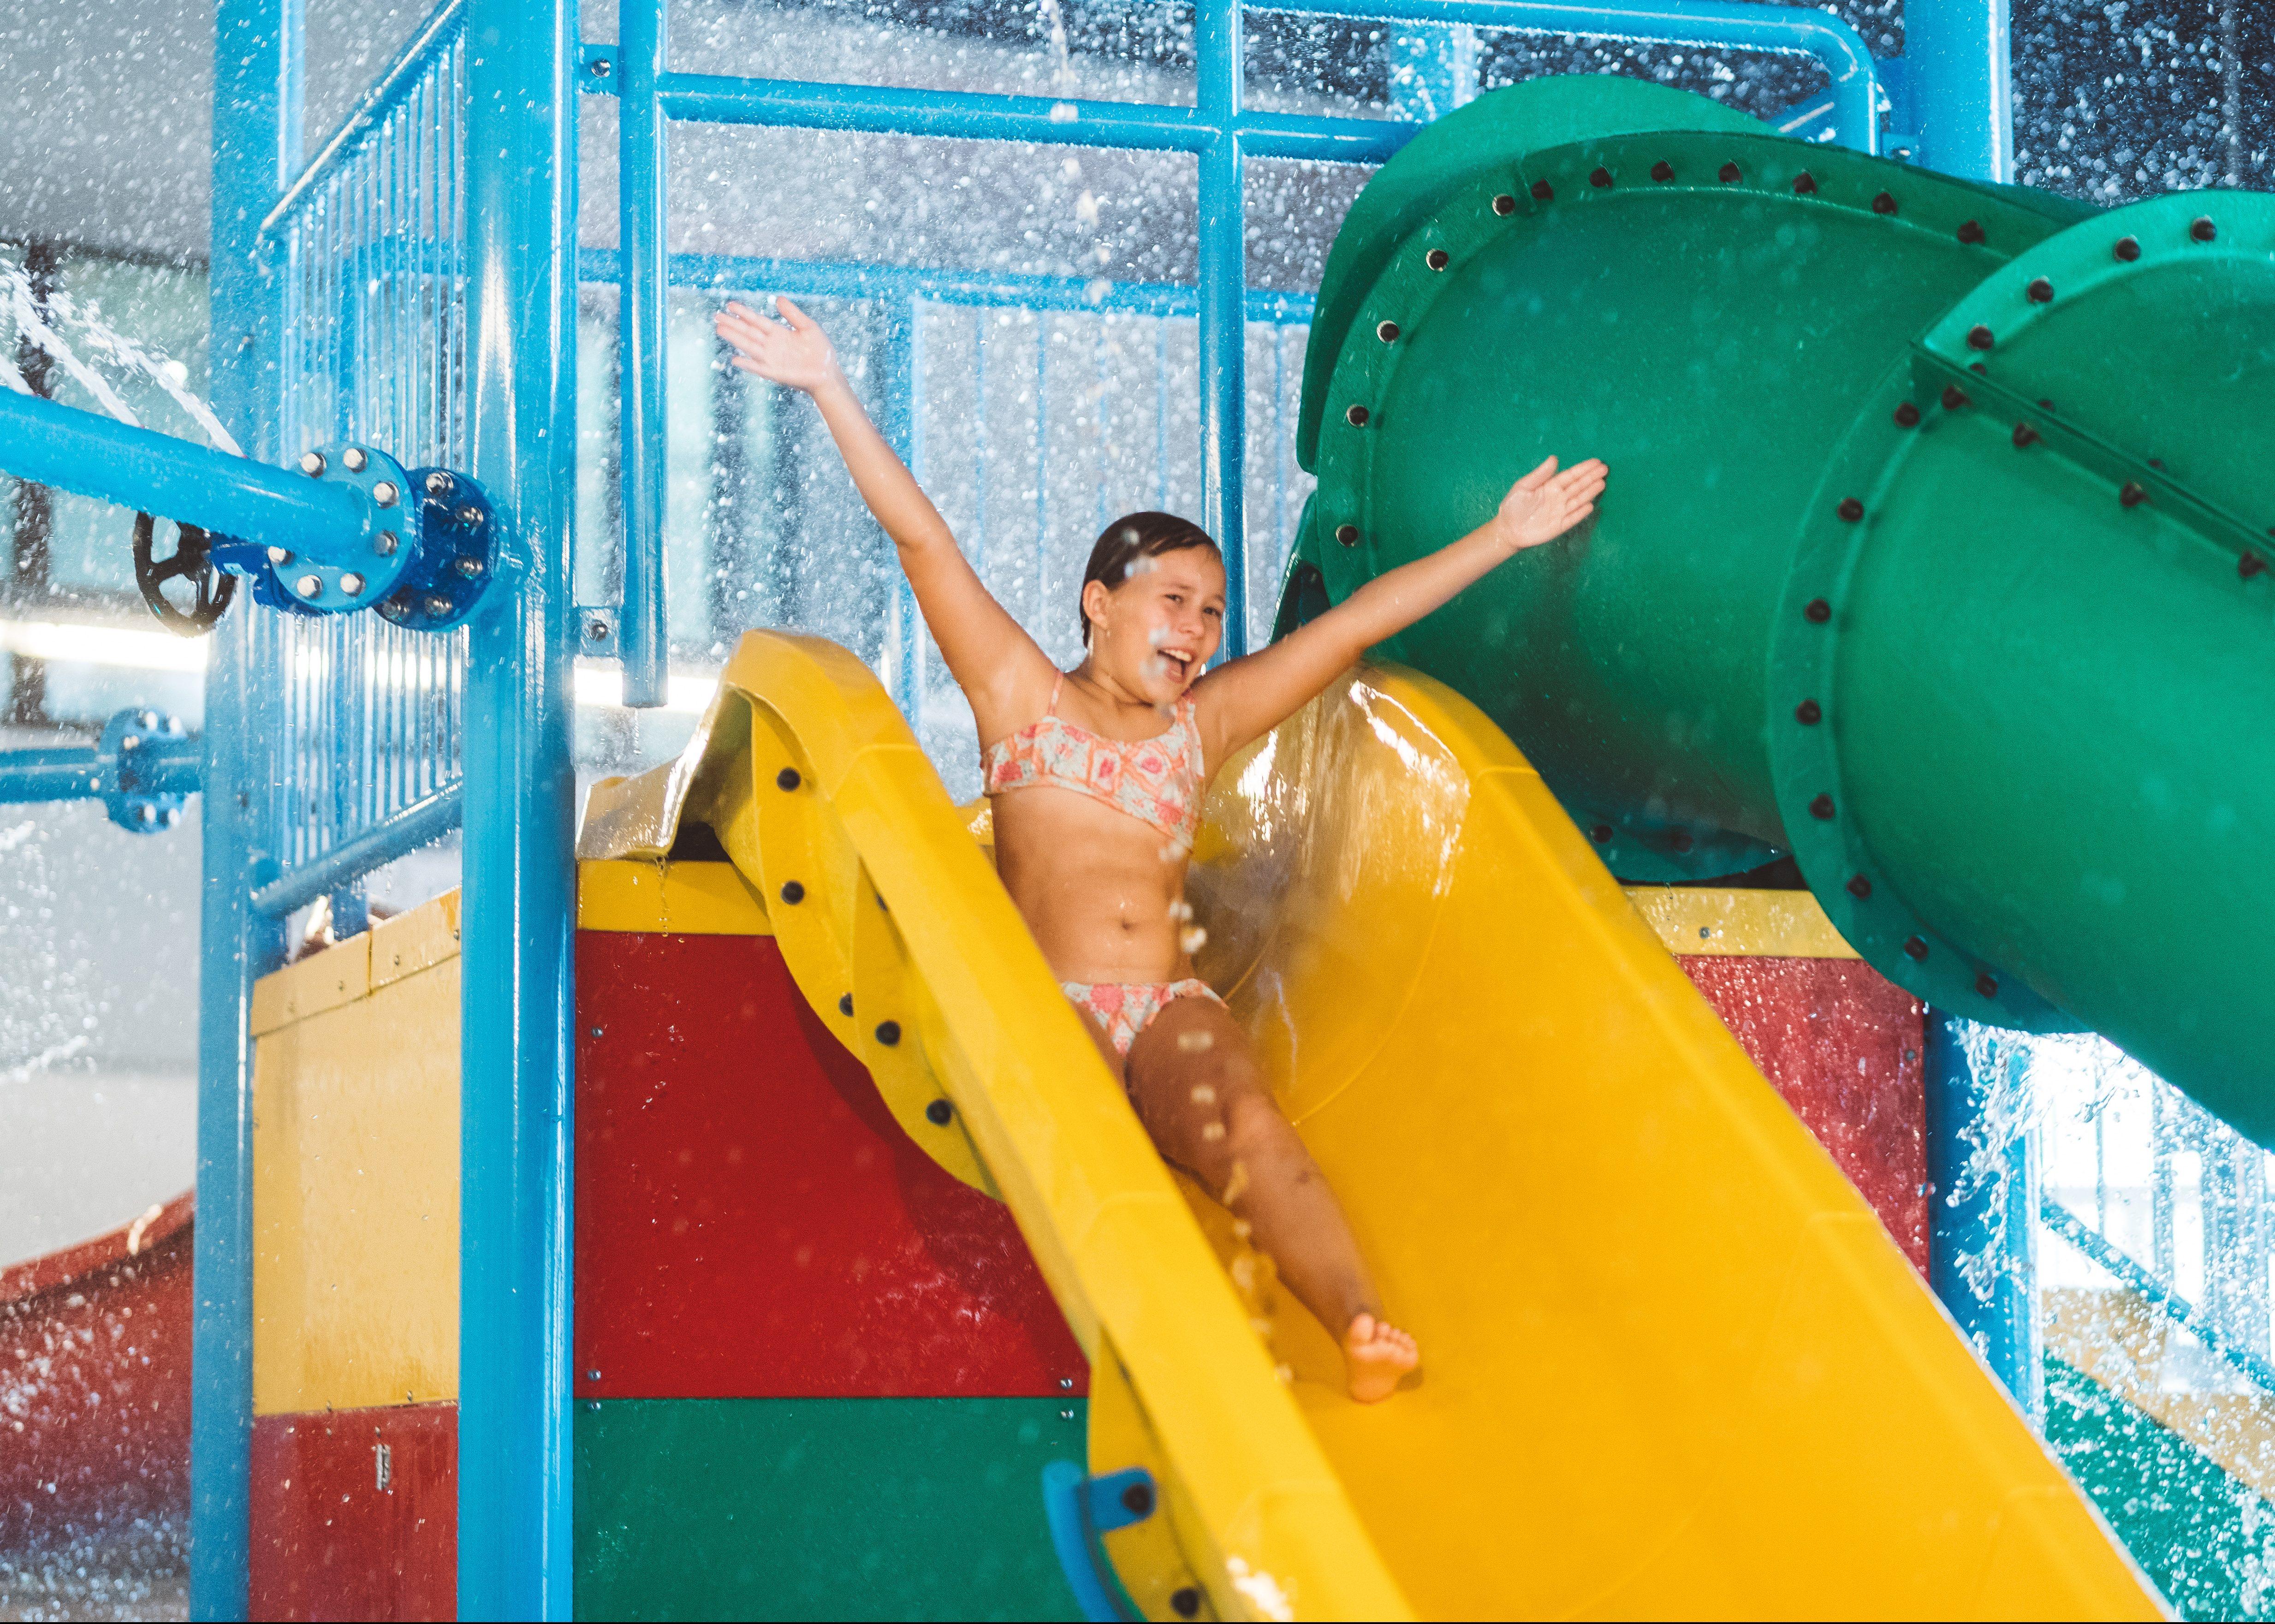 Savia proyectos parque acuático infantil interior niña tirándose por tobogán amarillo